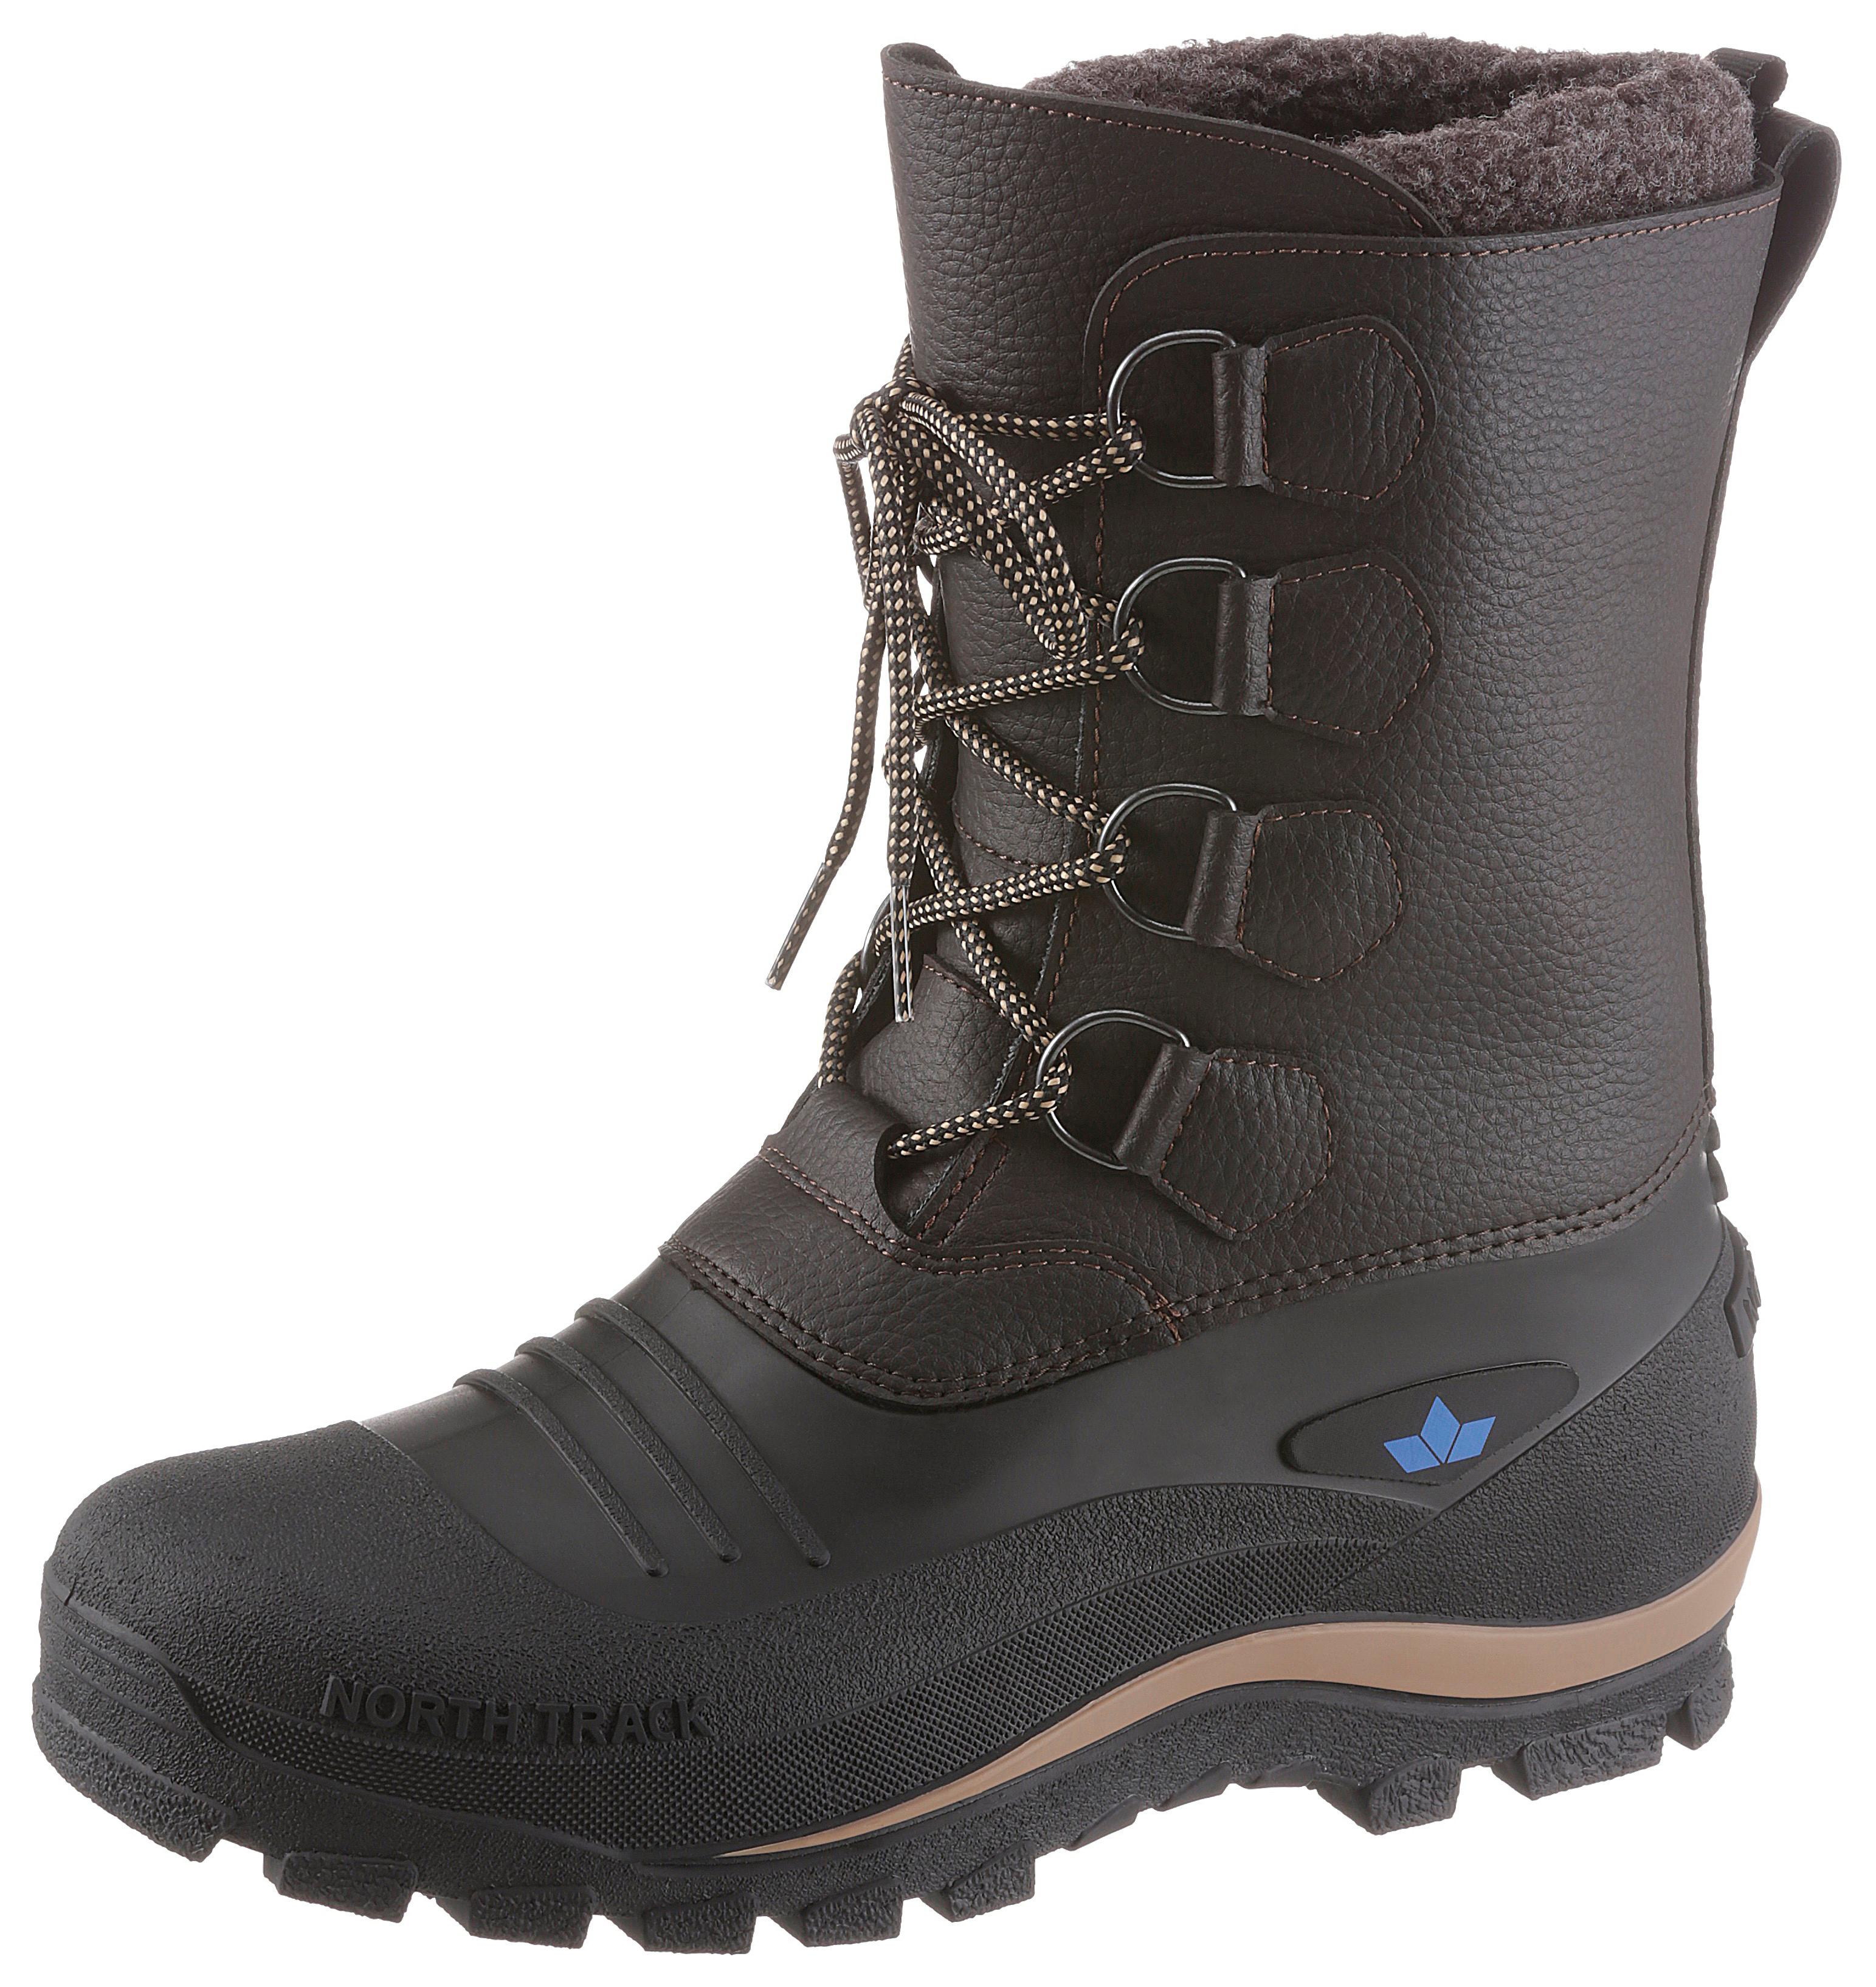 Lico Winterstiefel Wetmaster   Schuhe > Boots > Winterstiefel   Lico